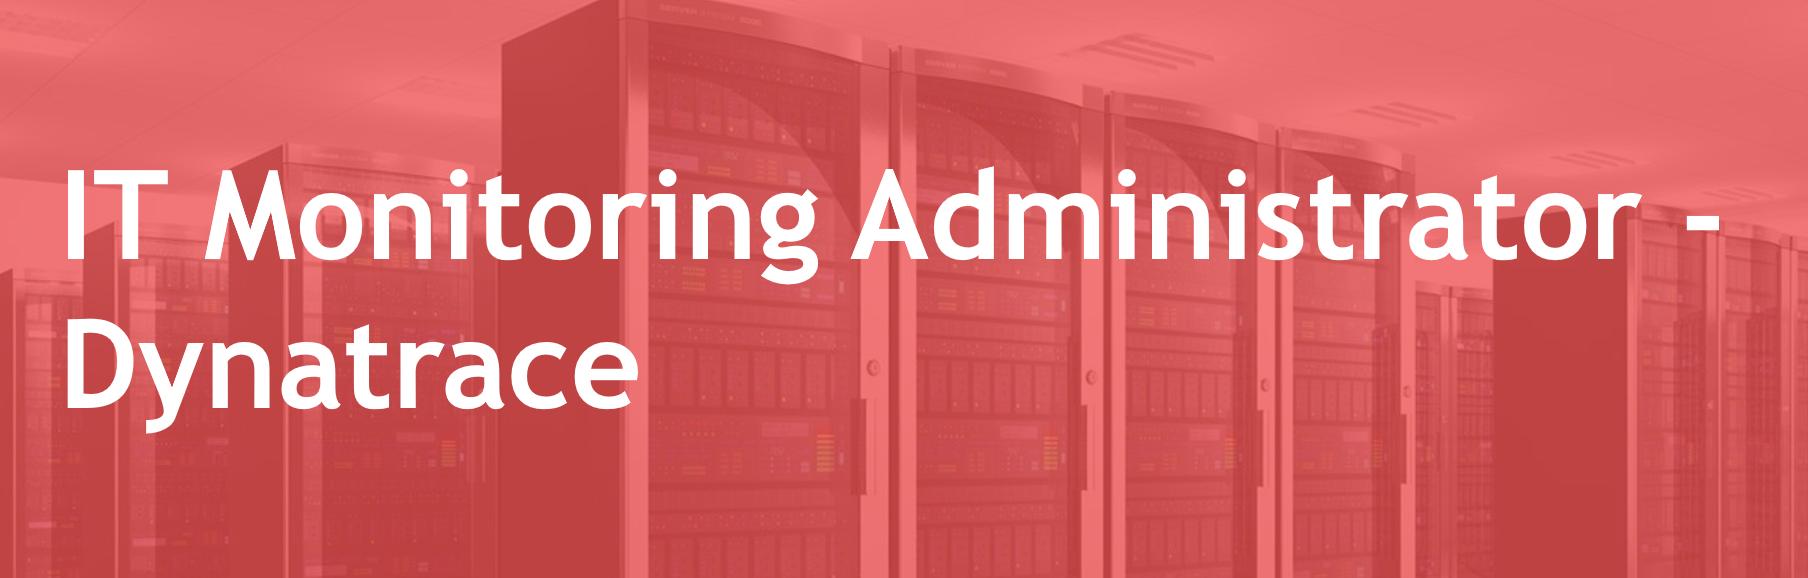 IT Monitoring Administrator - Dynatrace – FR/EN